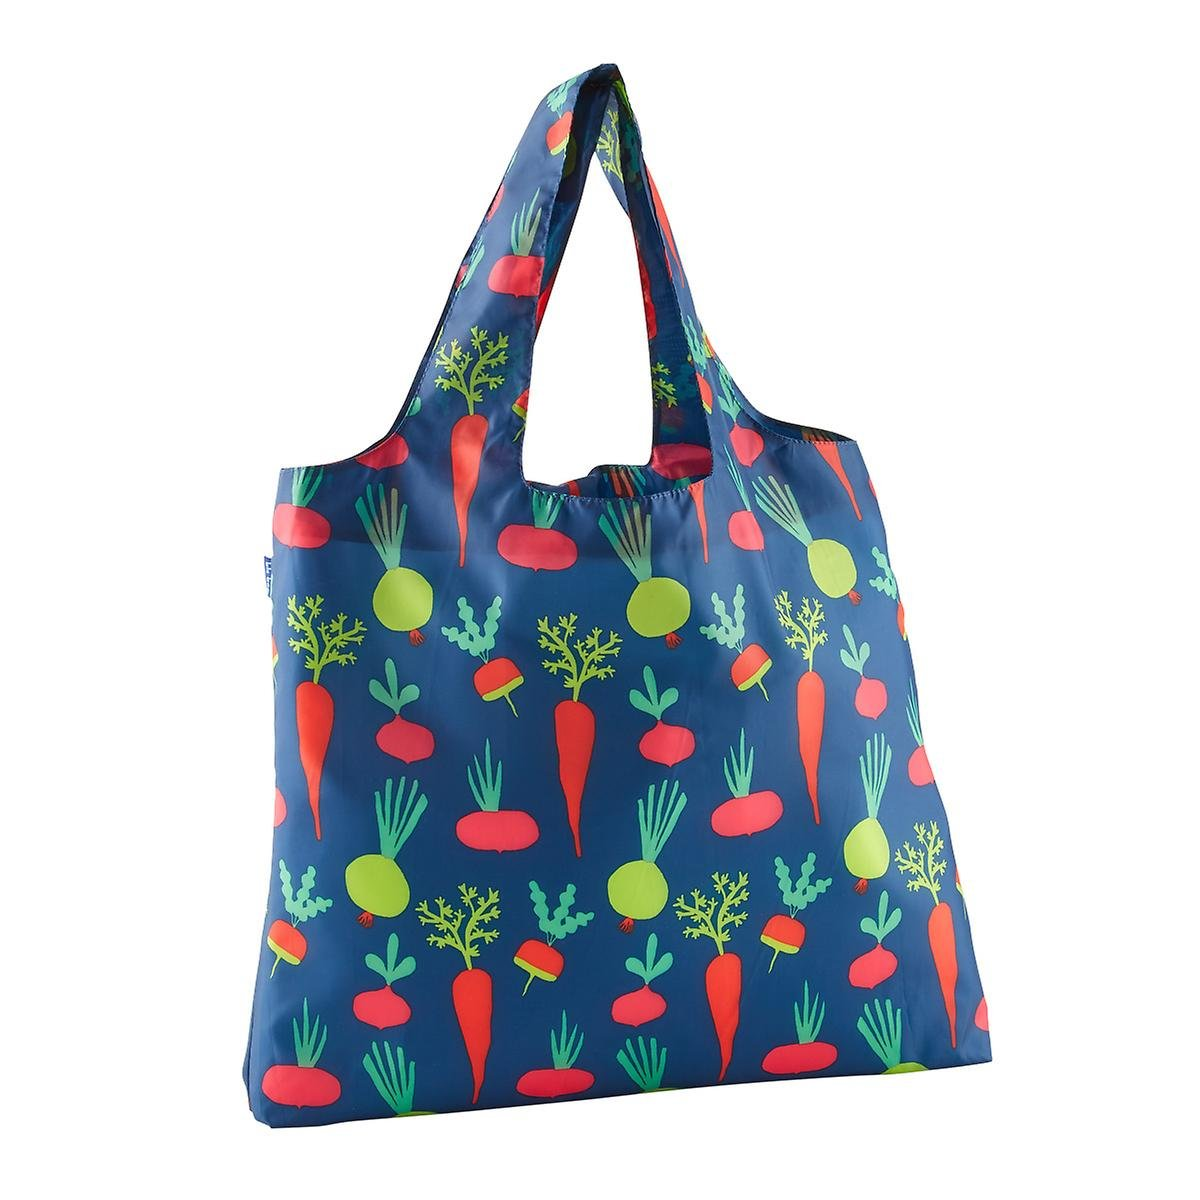 BluBag Reusable Shopping Bag - Root Veggies